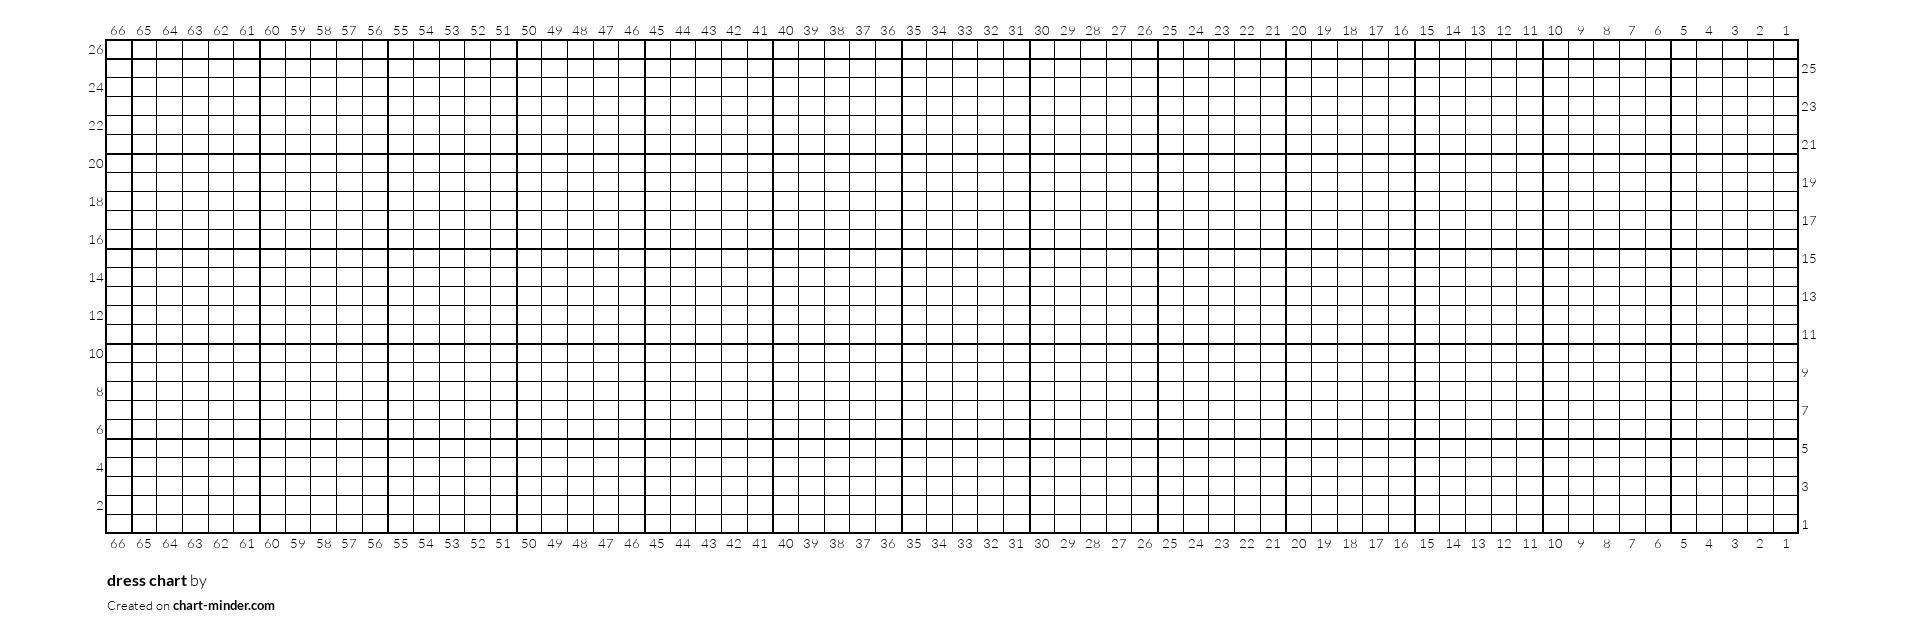 dress chart